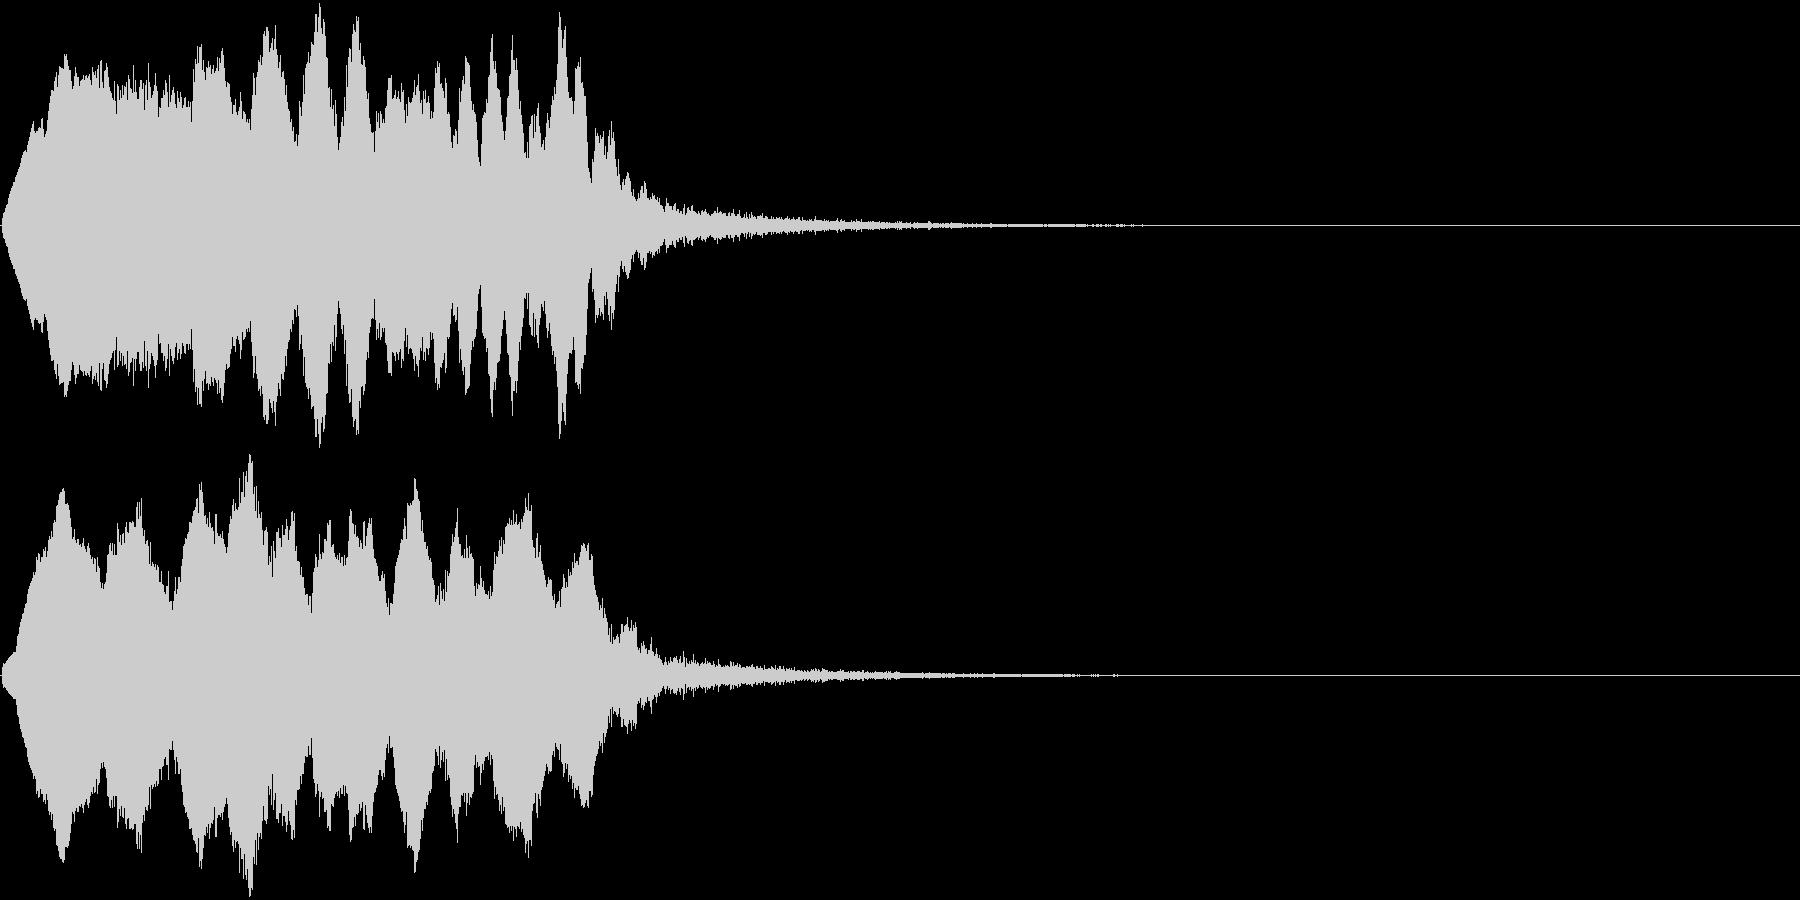 TVFX ポワーン クイズ出題前 上昇音の未再生の波形